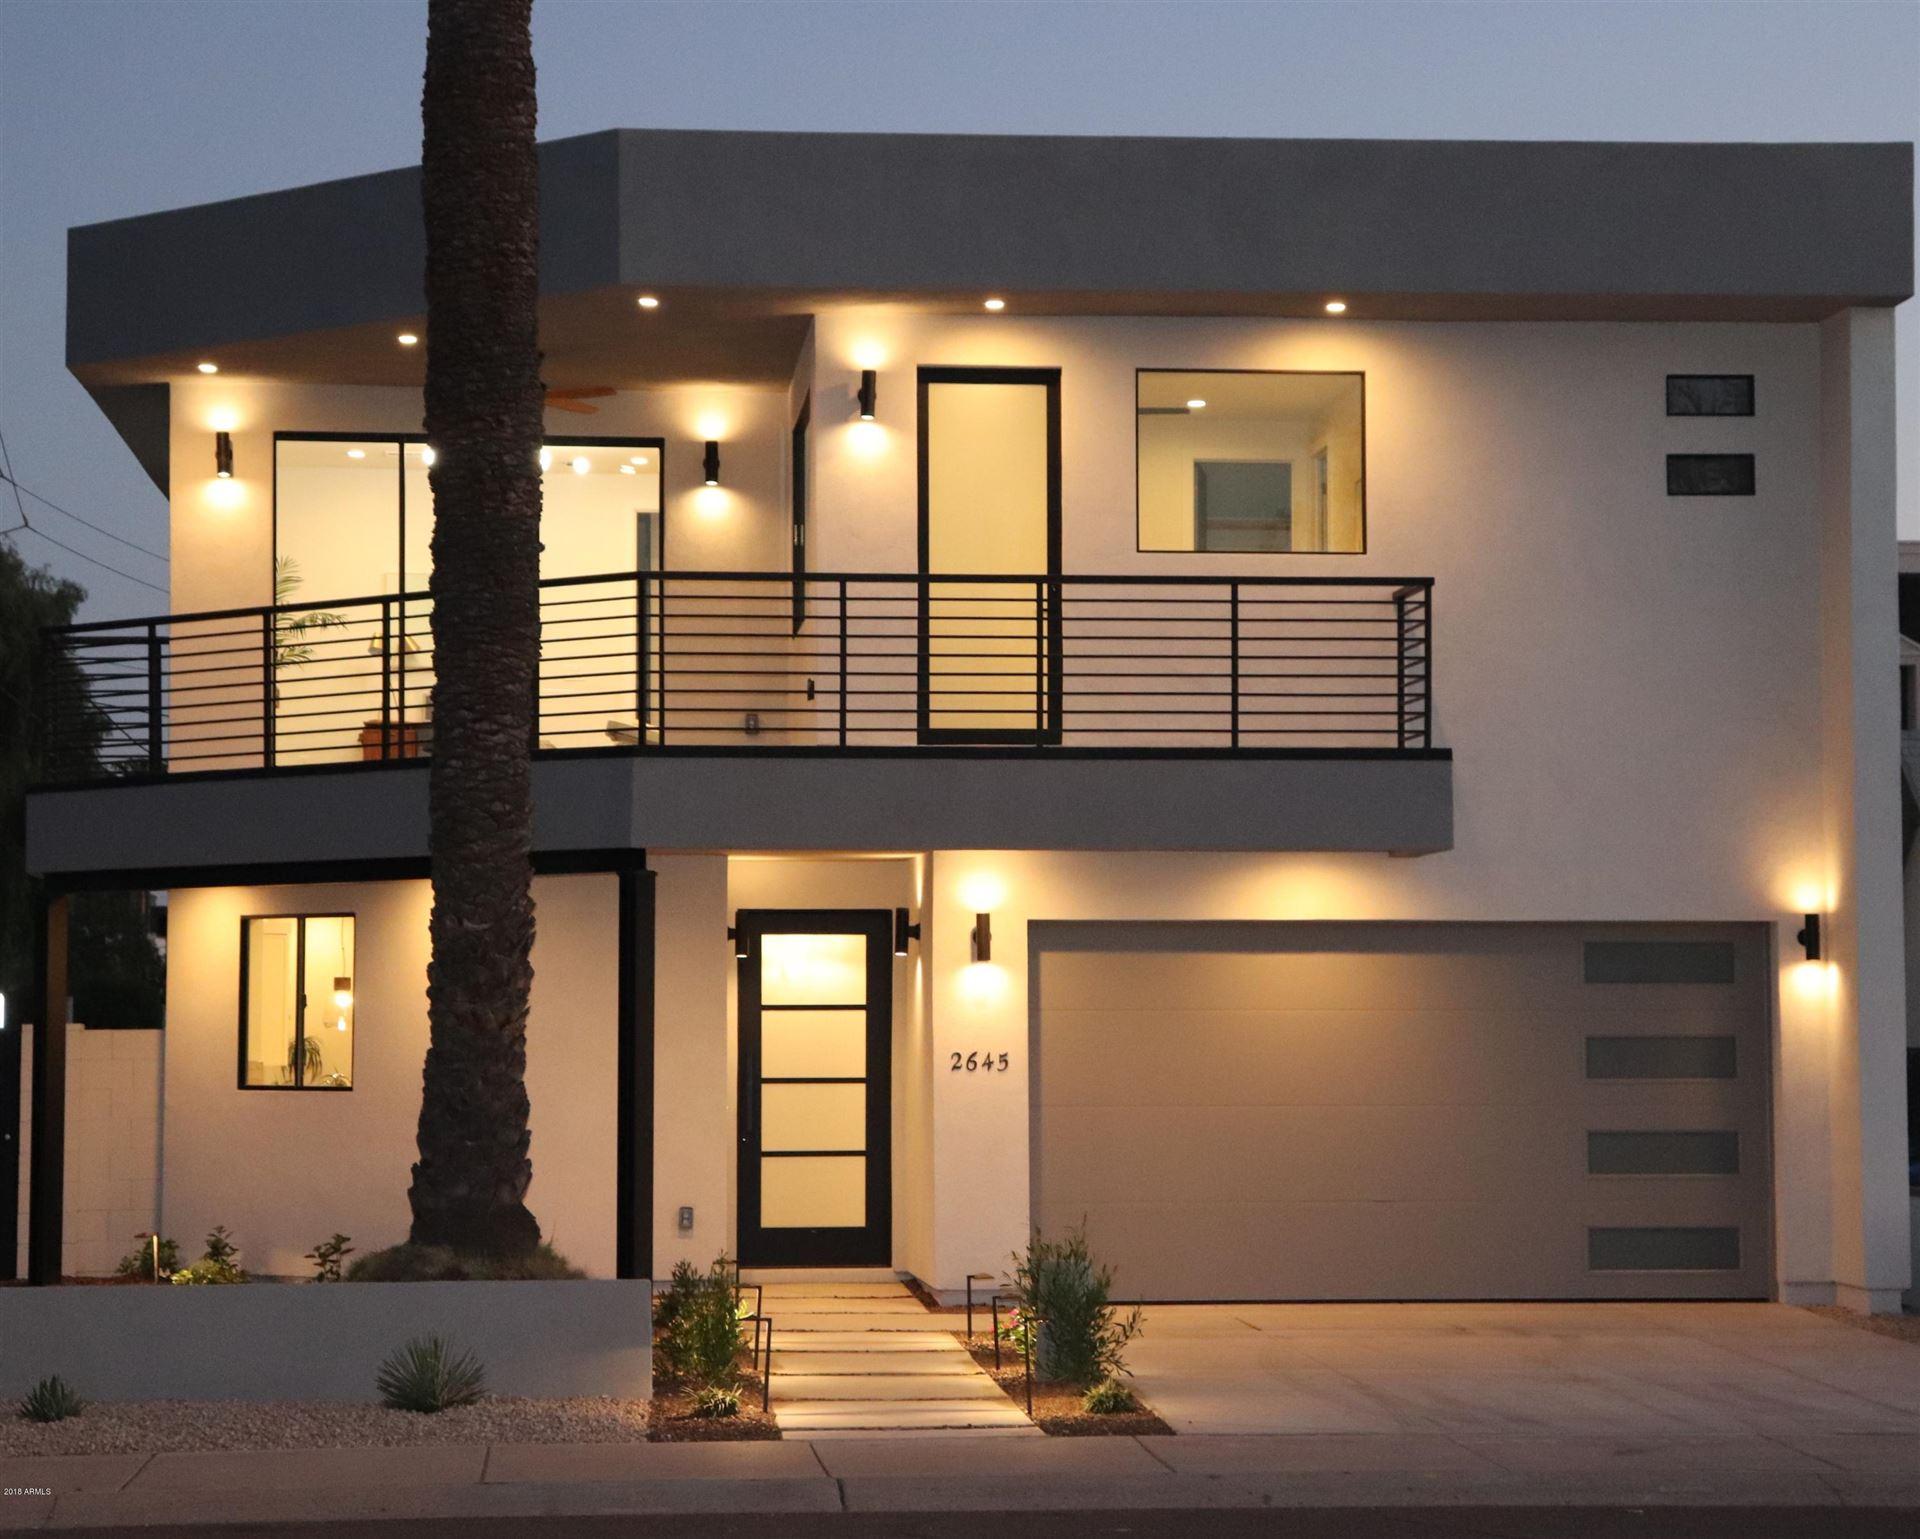 2645 E Campbell Avenue, Phoenix, AZ 85016 - MLS#: 6243499